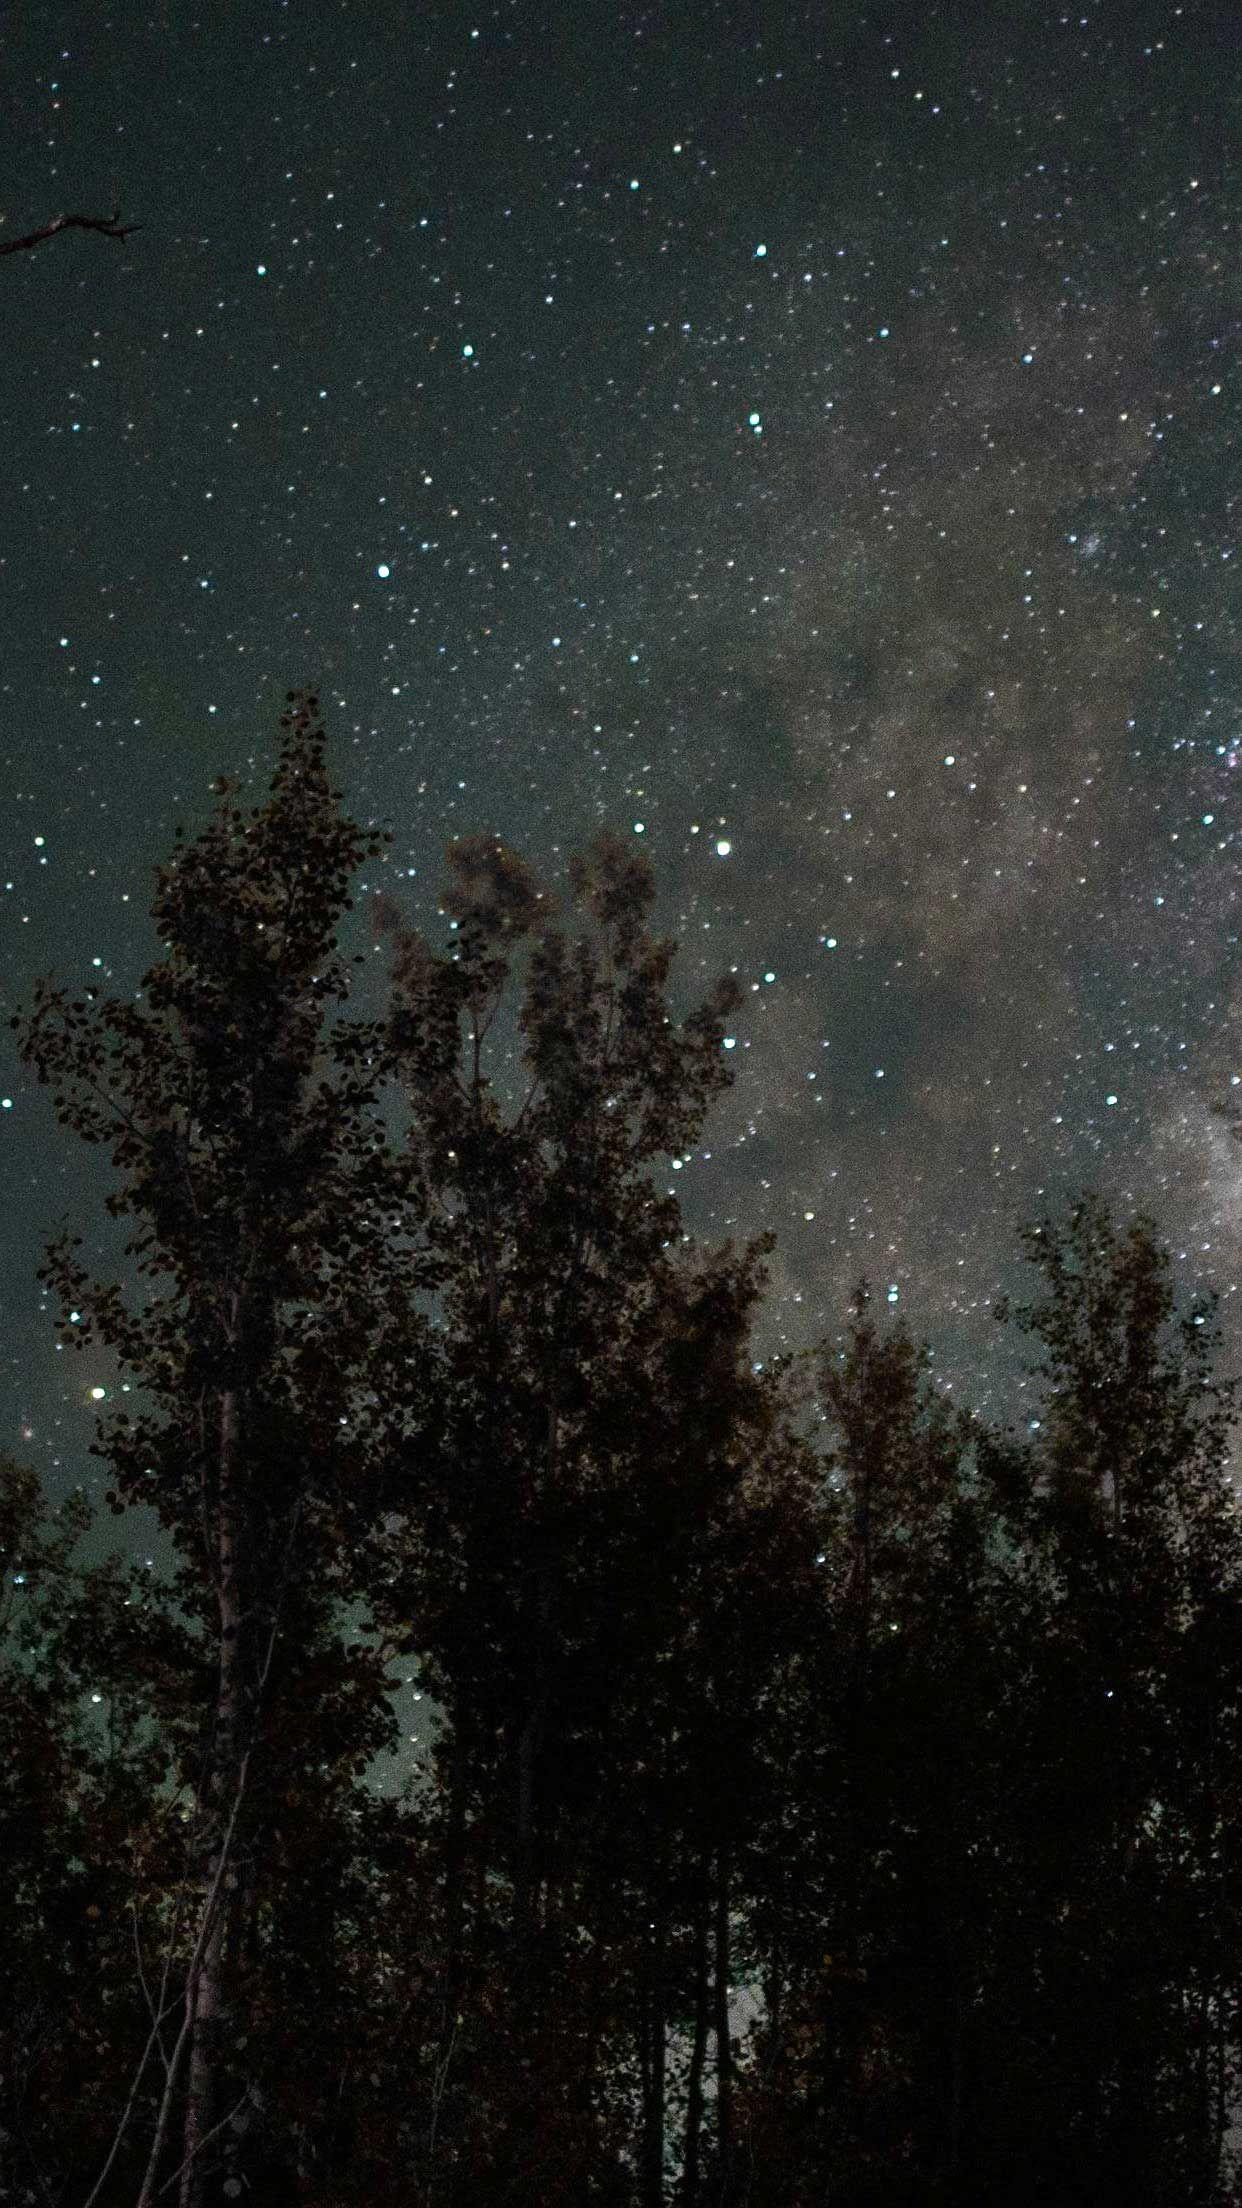 Iphone Wallpaper Starry sky stars trees night wallpaper